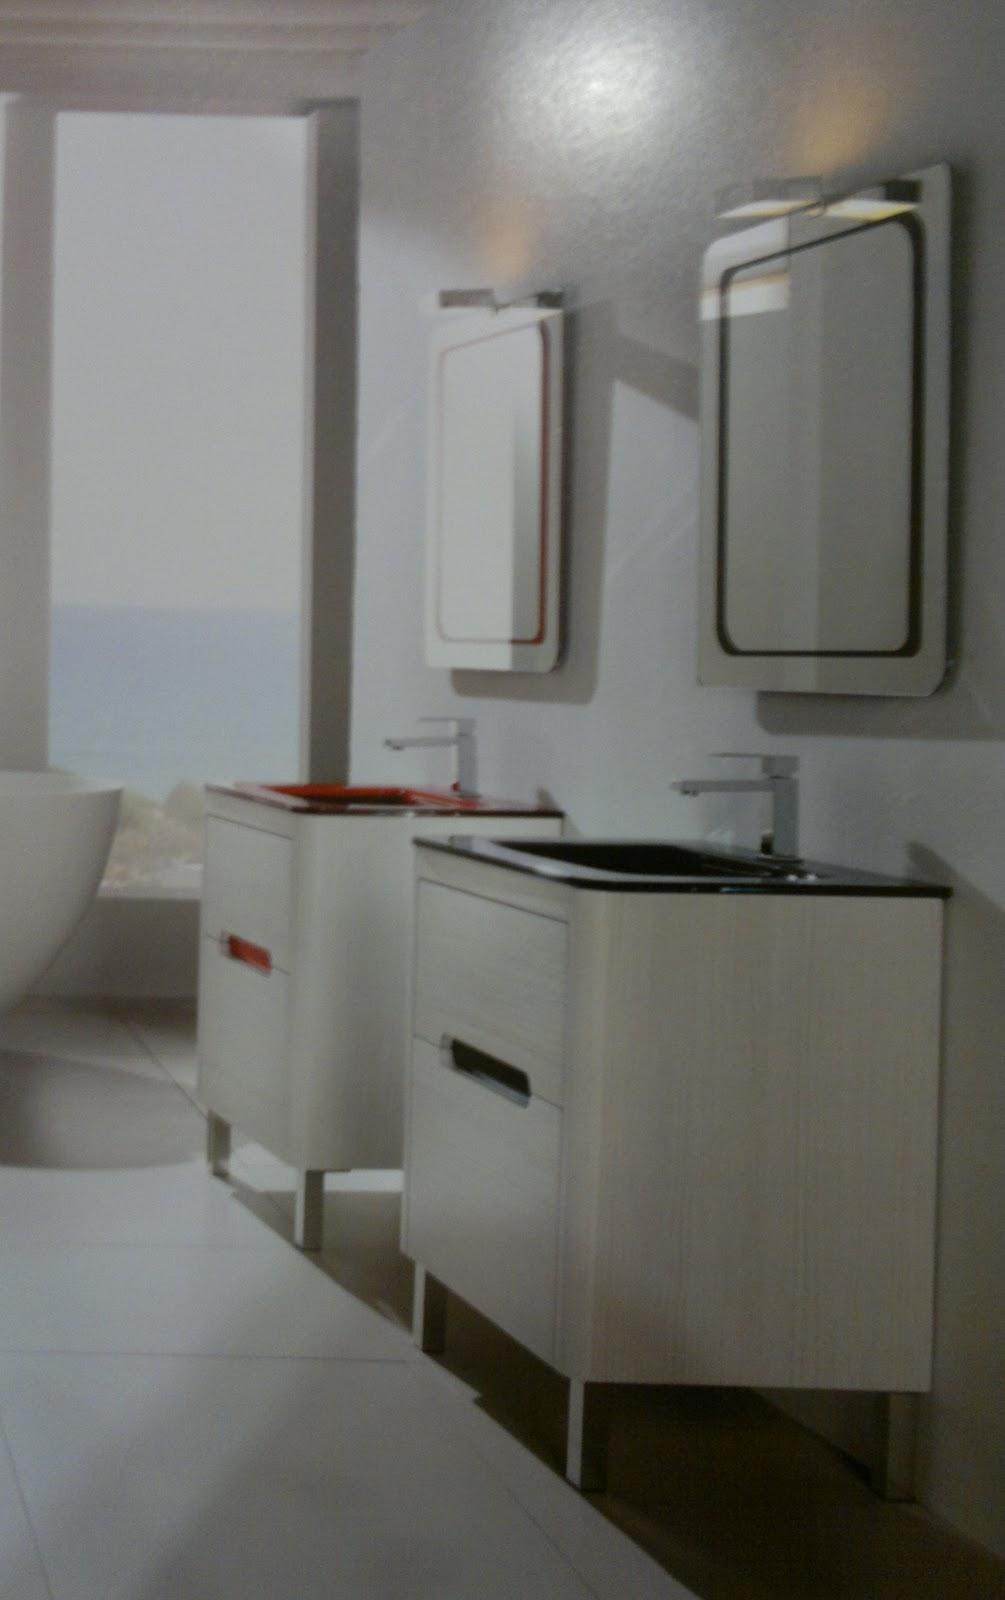 Mueble Muebles De Ba O Ordo Ez Catalogo Galer A De Fotos De  # Muebles Ordonez